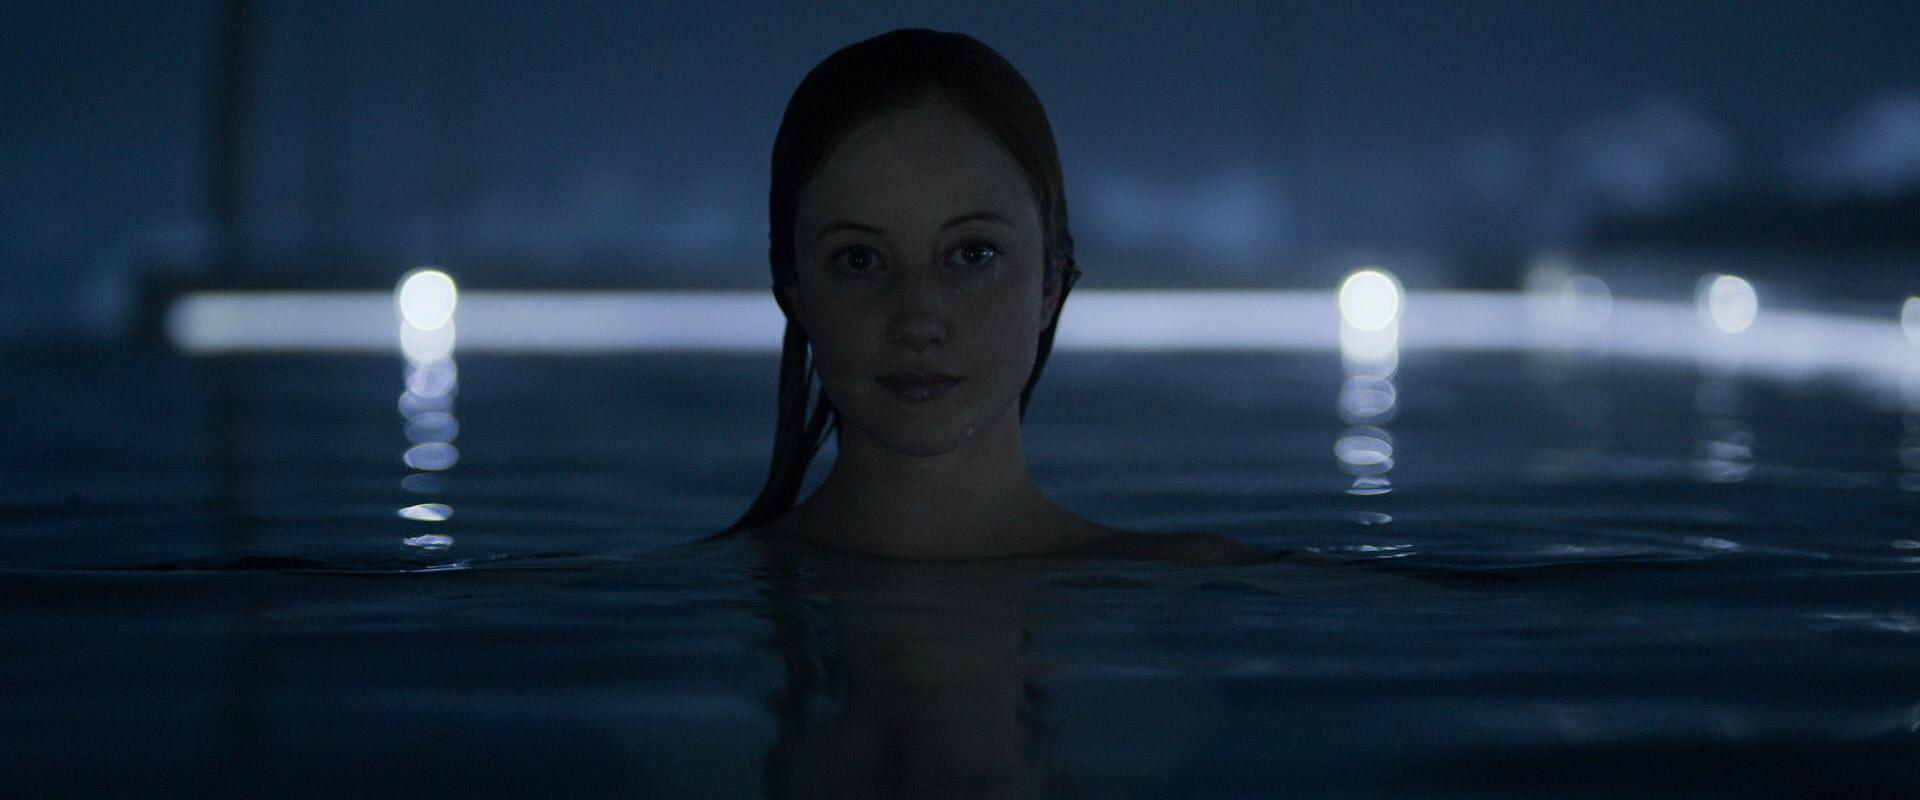 Oblivion naked pool scene, story tiny asian teen girl cock